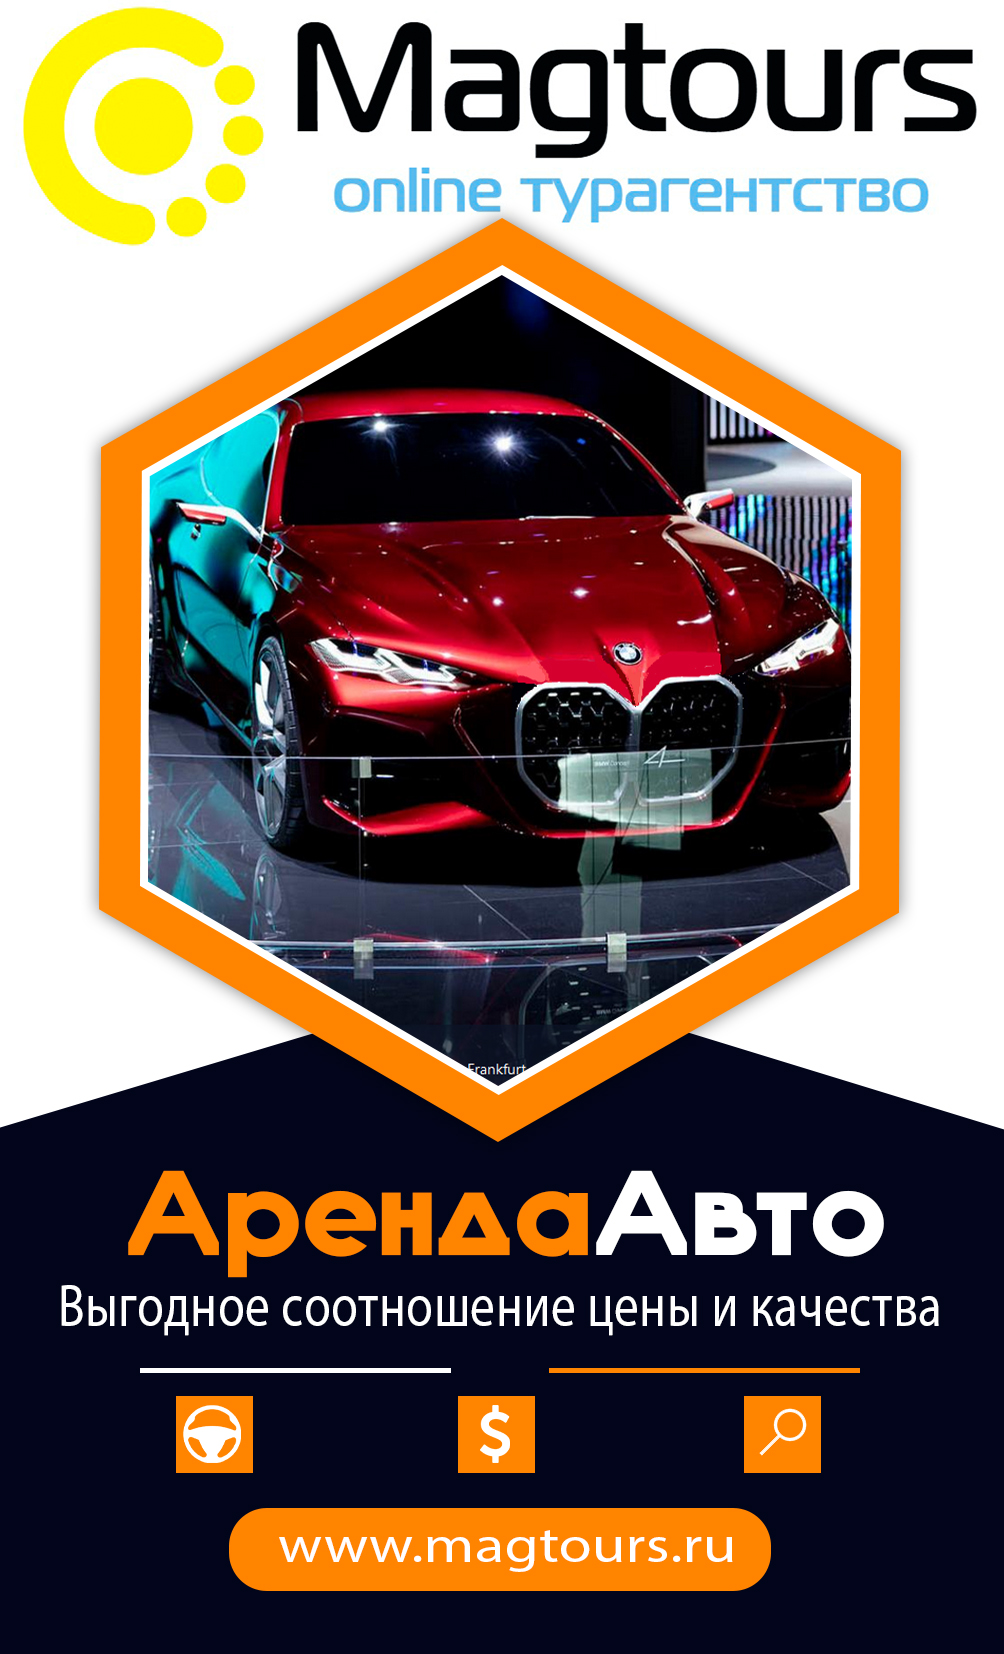 Магазин Туров - Аренда автомобилей